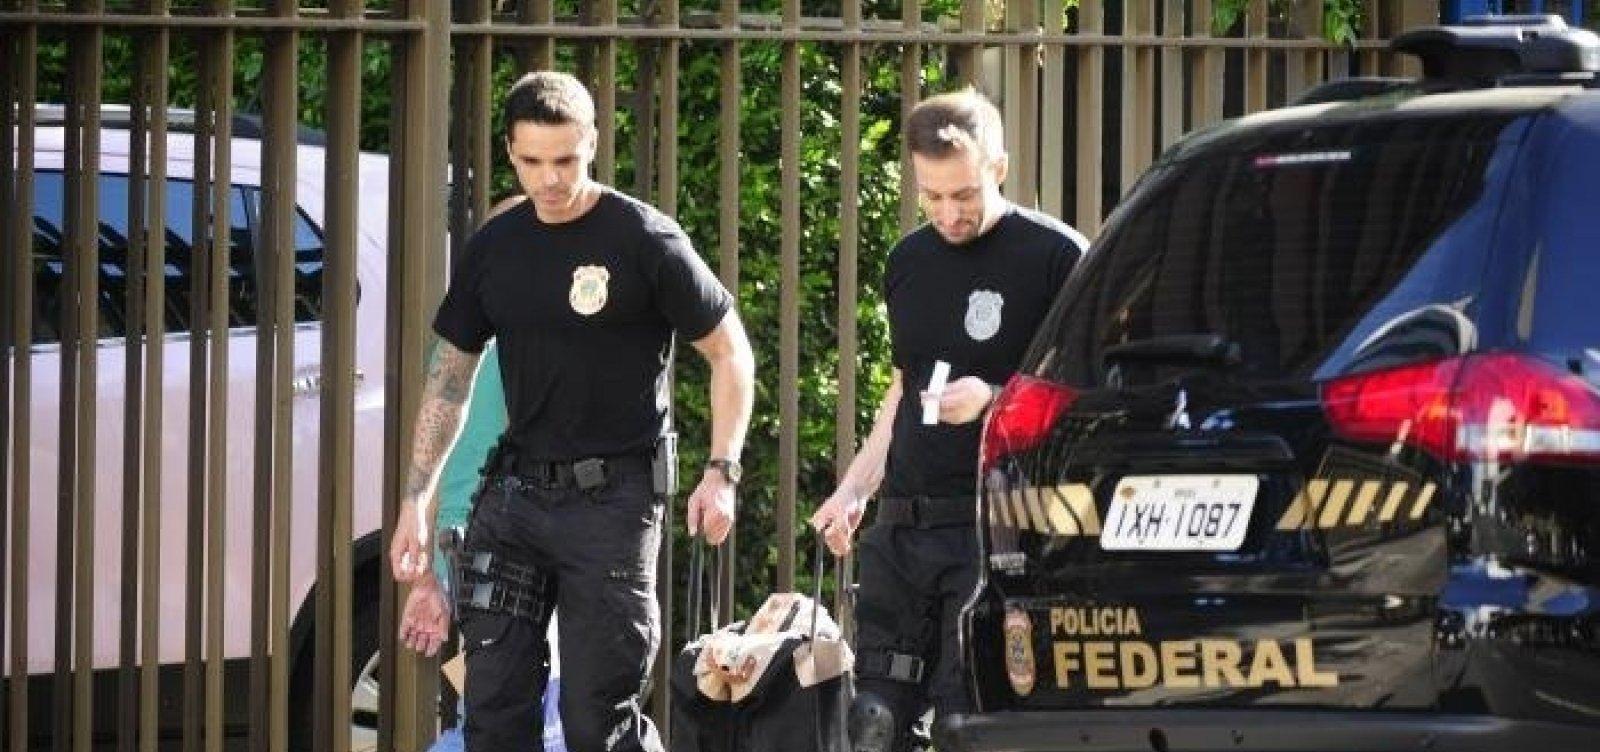 Polícia Federal realiza buscas para apurar propinas da Odebrecht